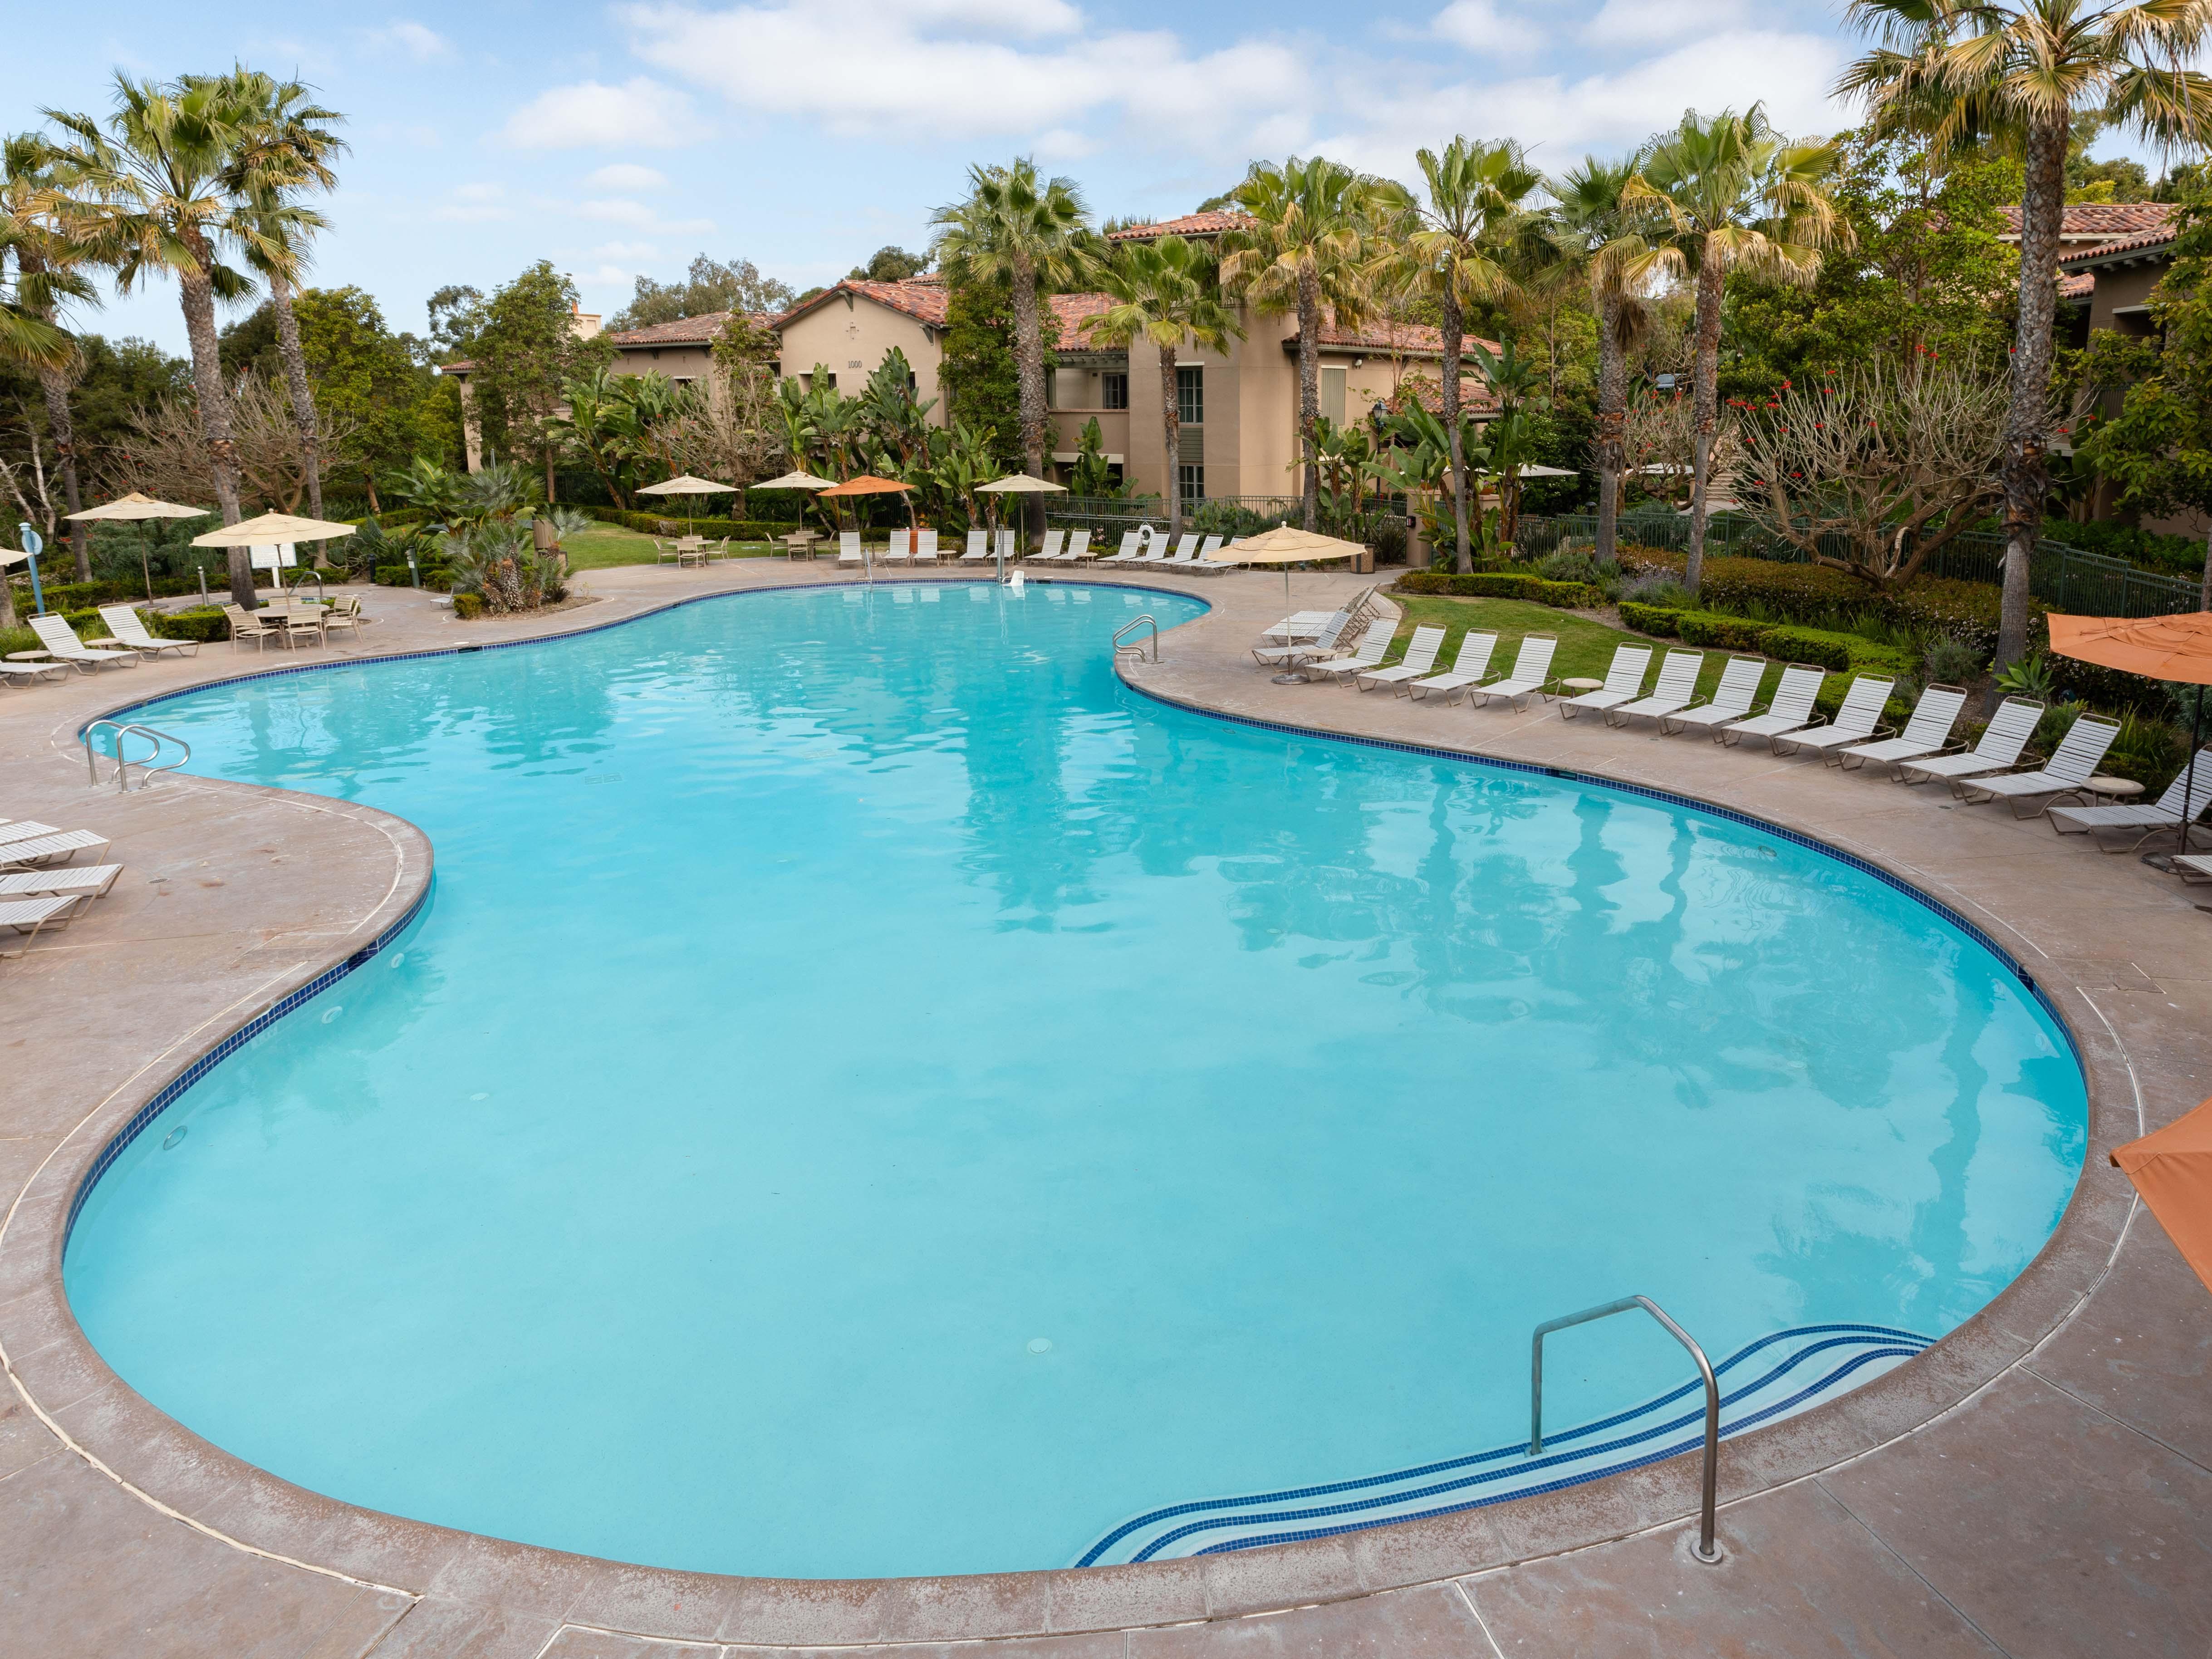 Marriott's Newport Coast<span class='trademark'>®</span> Villas Tide Pool. Marriott's Newport Coast<span class='trademark'>®</span> Villas is located in Newport Coast, California United States.